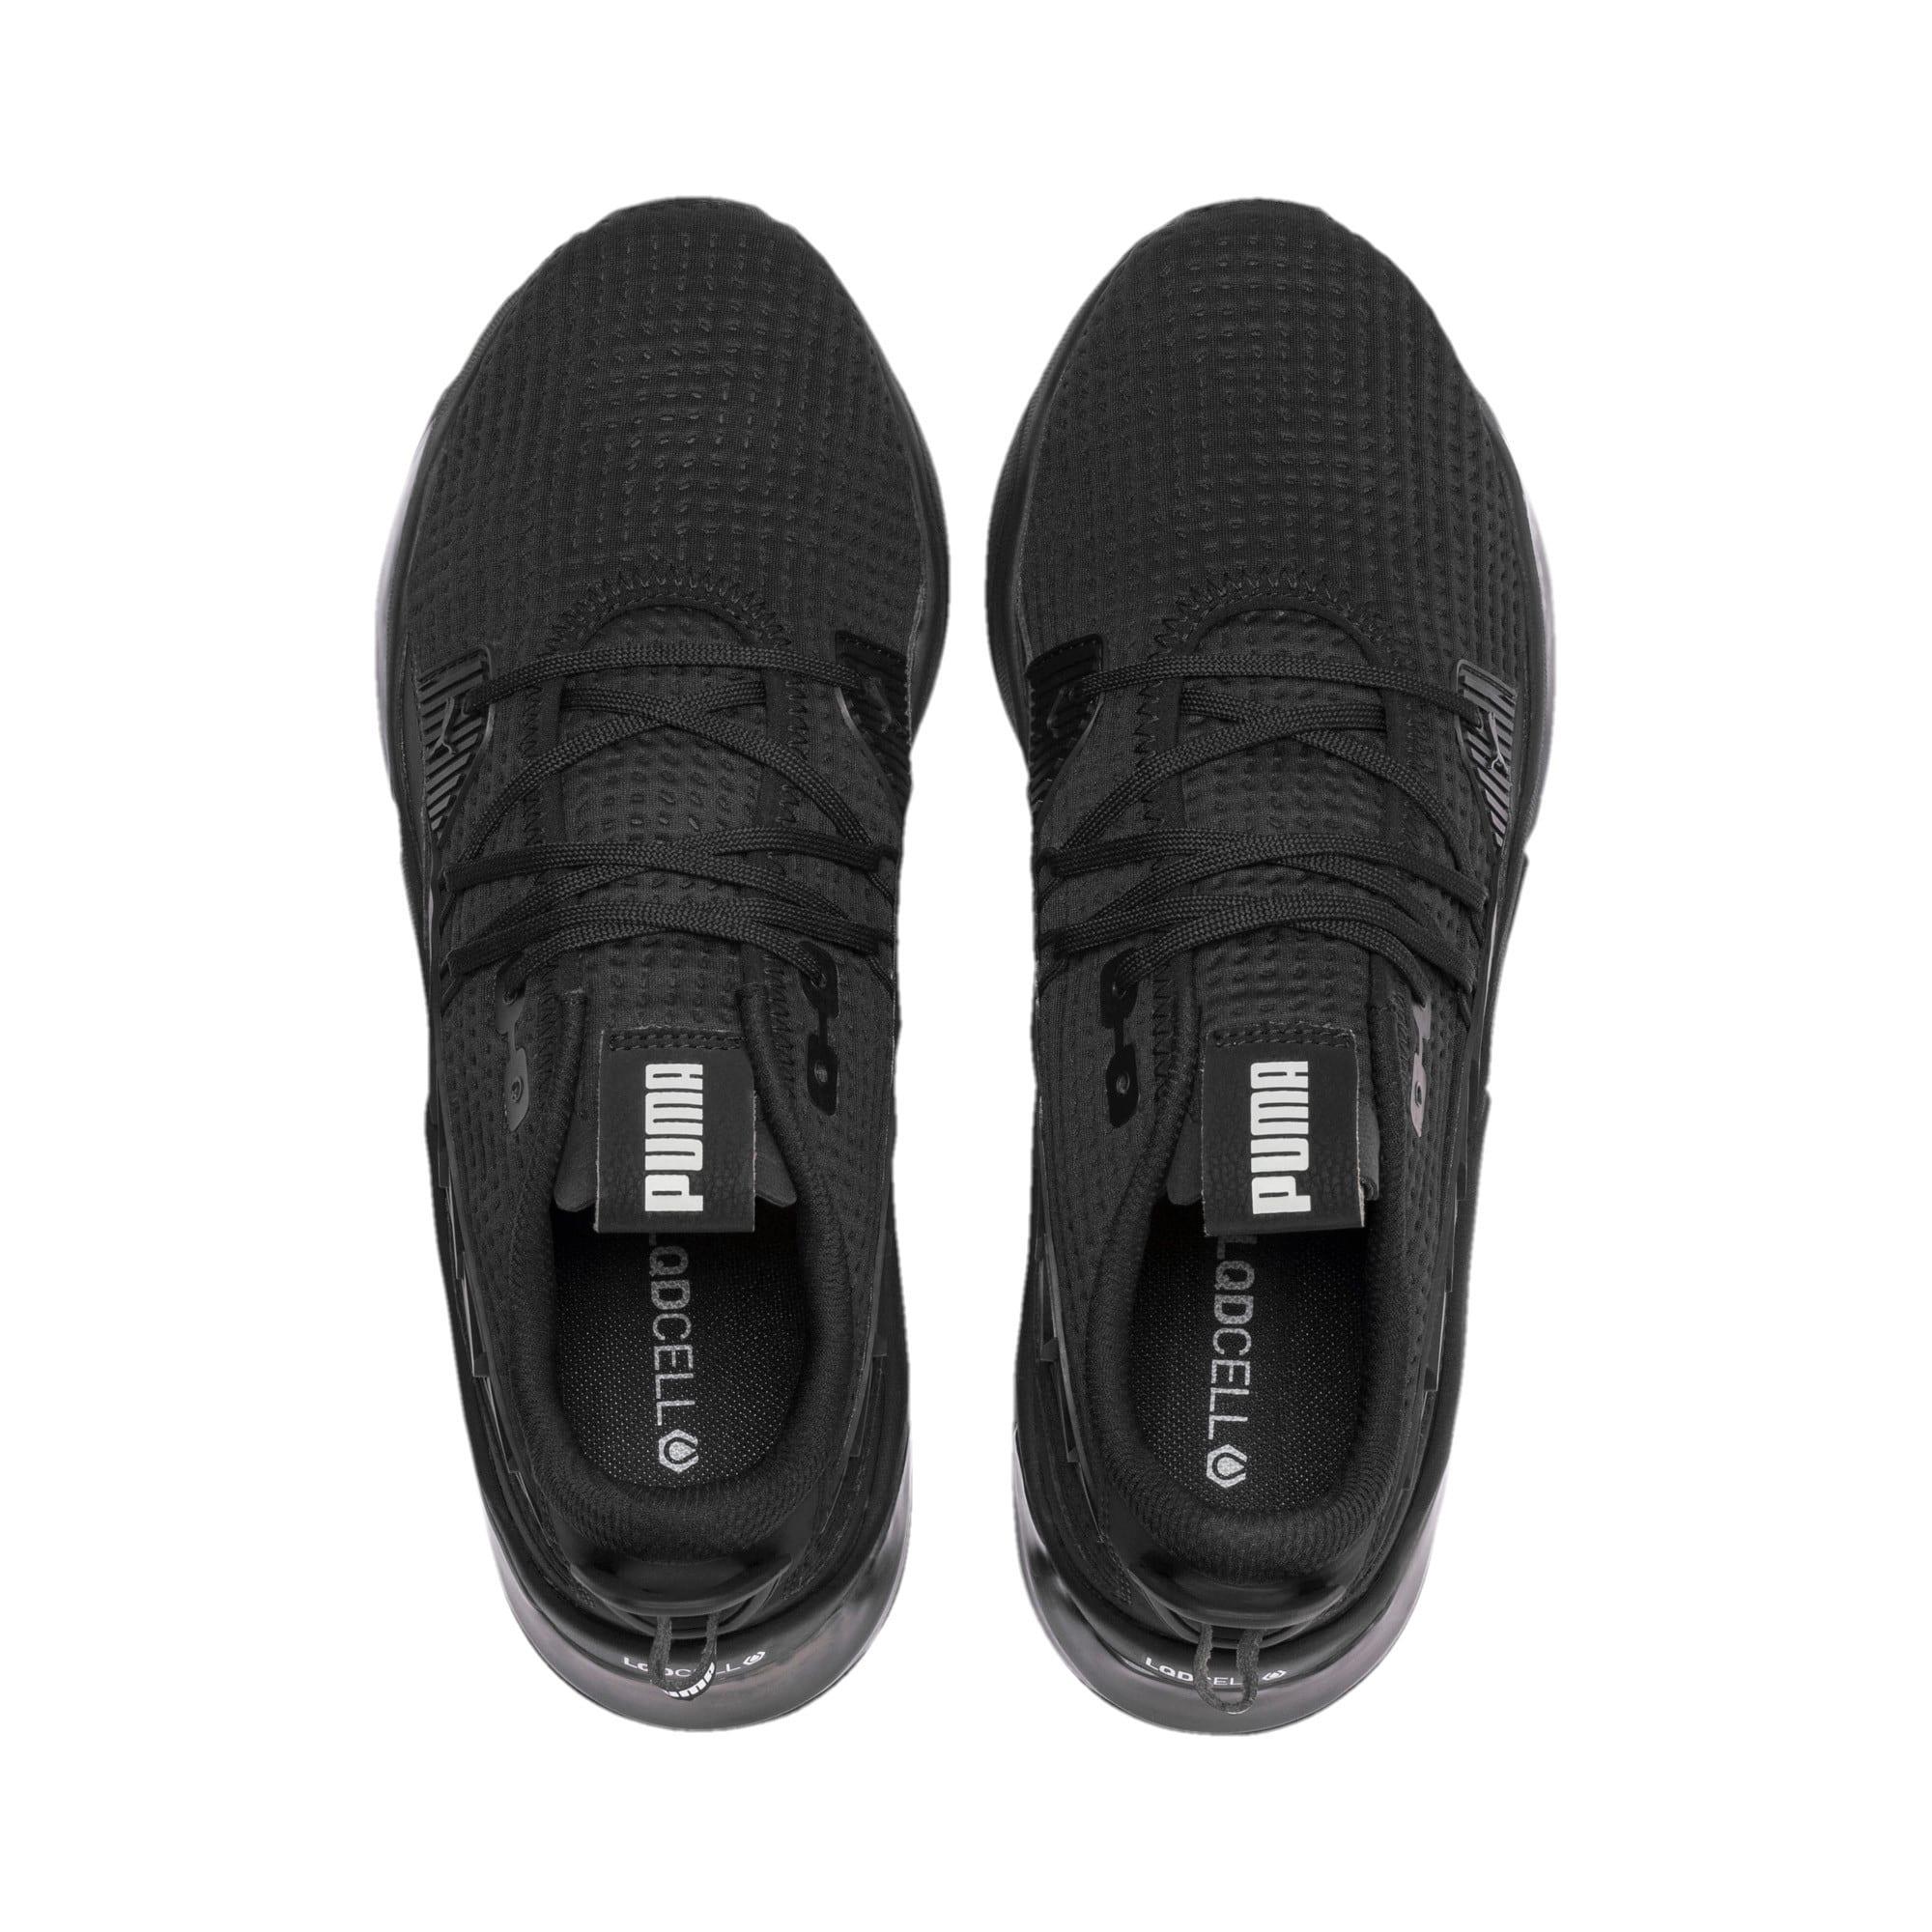 Thumbnail 4 of LQDCELL Optic Flight Suit Men's Running Shoes, Puma Black, medium-IND